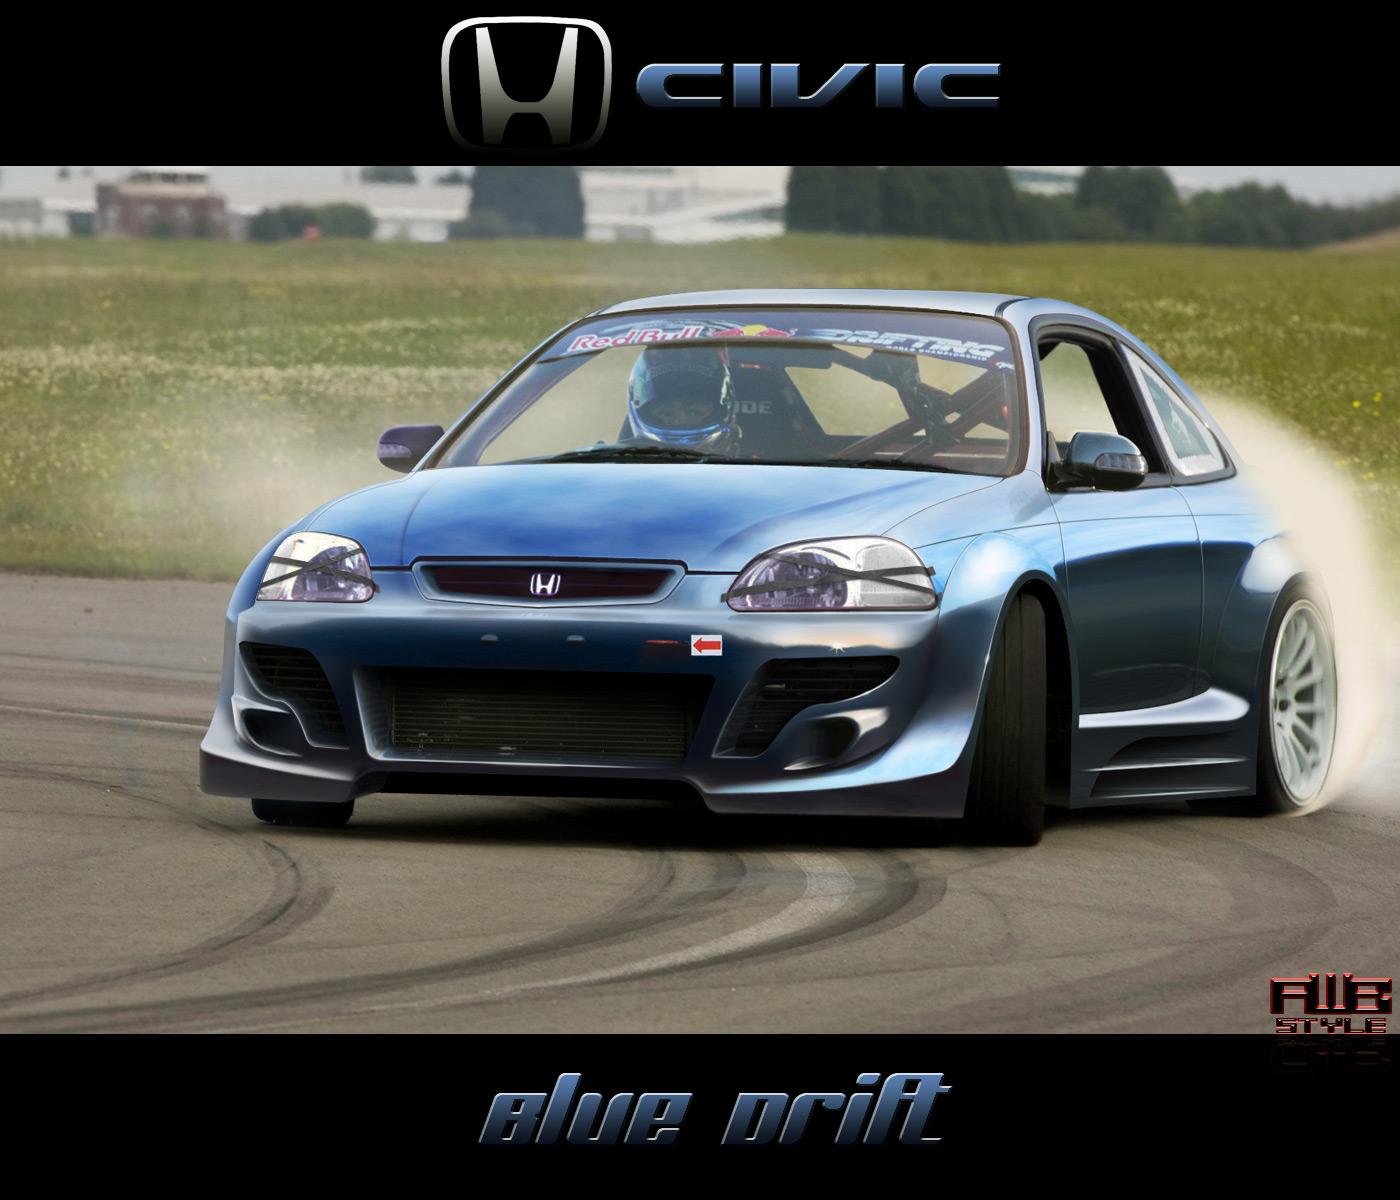 Honda civic drifting videos